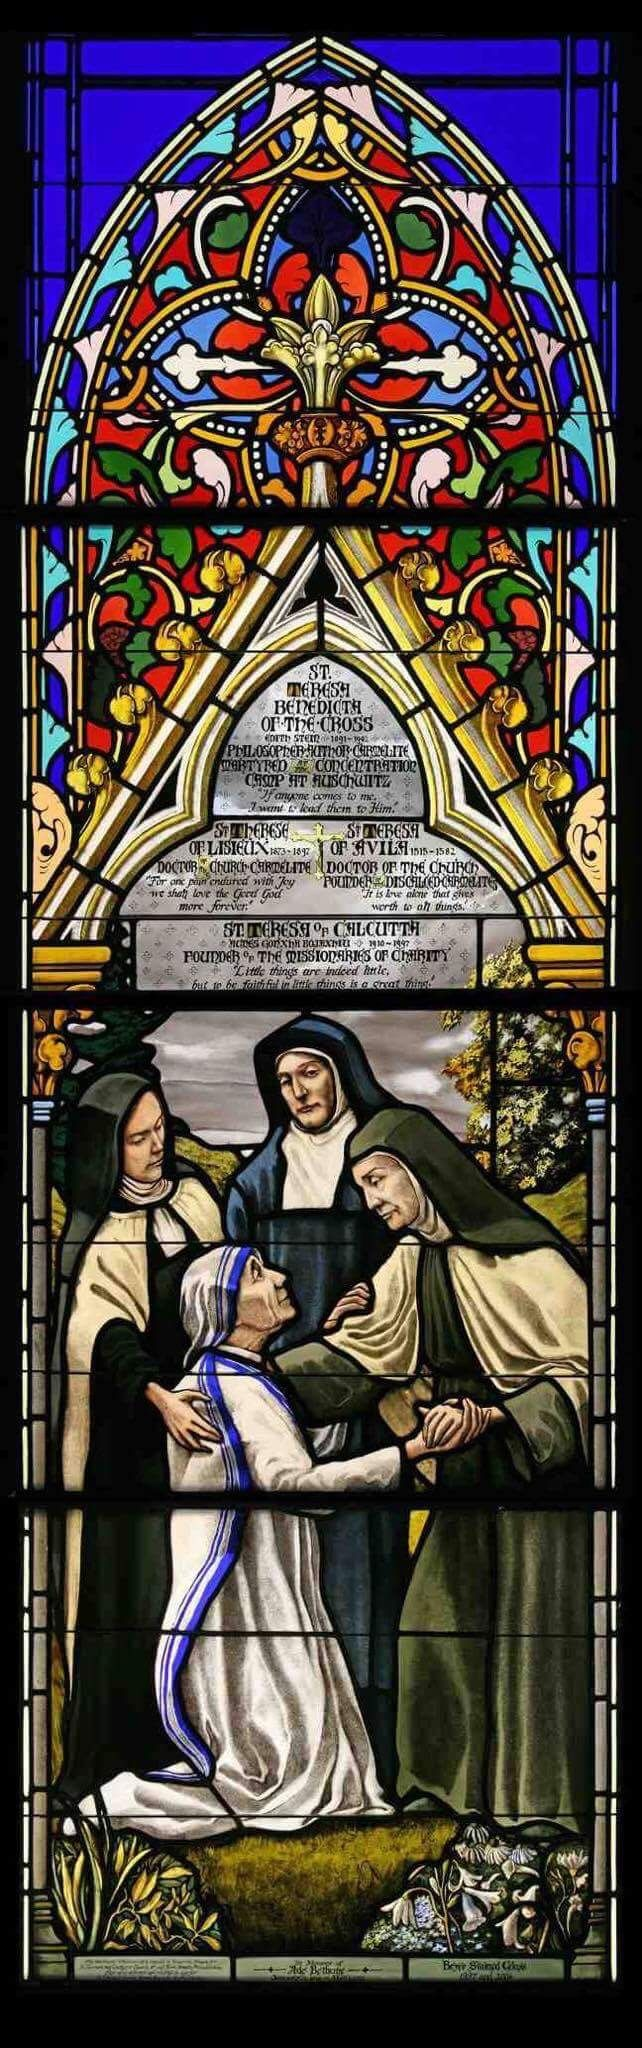 Welcoming a new Saint : St Teresa of Calcutta                                                                                                                                                                                 More